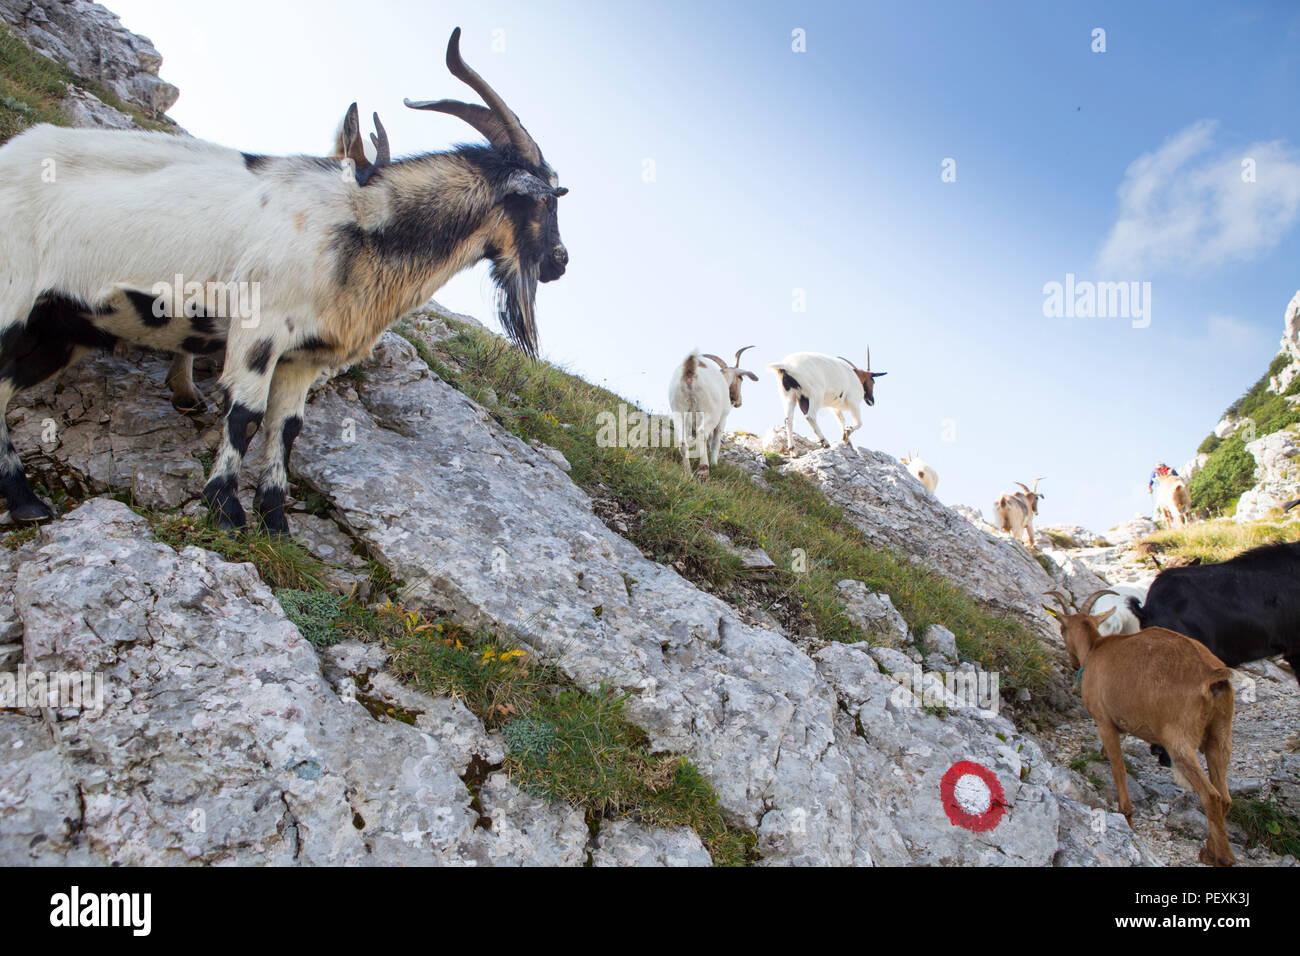 Vratca pass near Mount Vogel, Triglav National Park, Slovenia - Stock Image